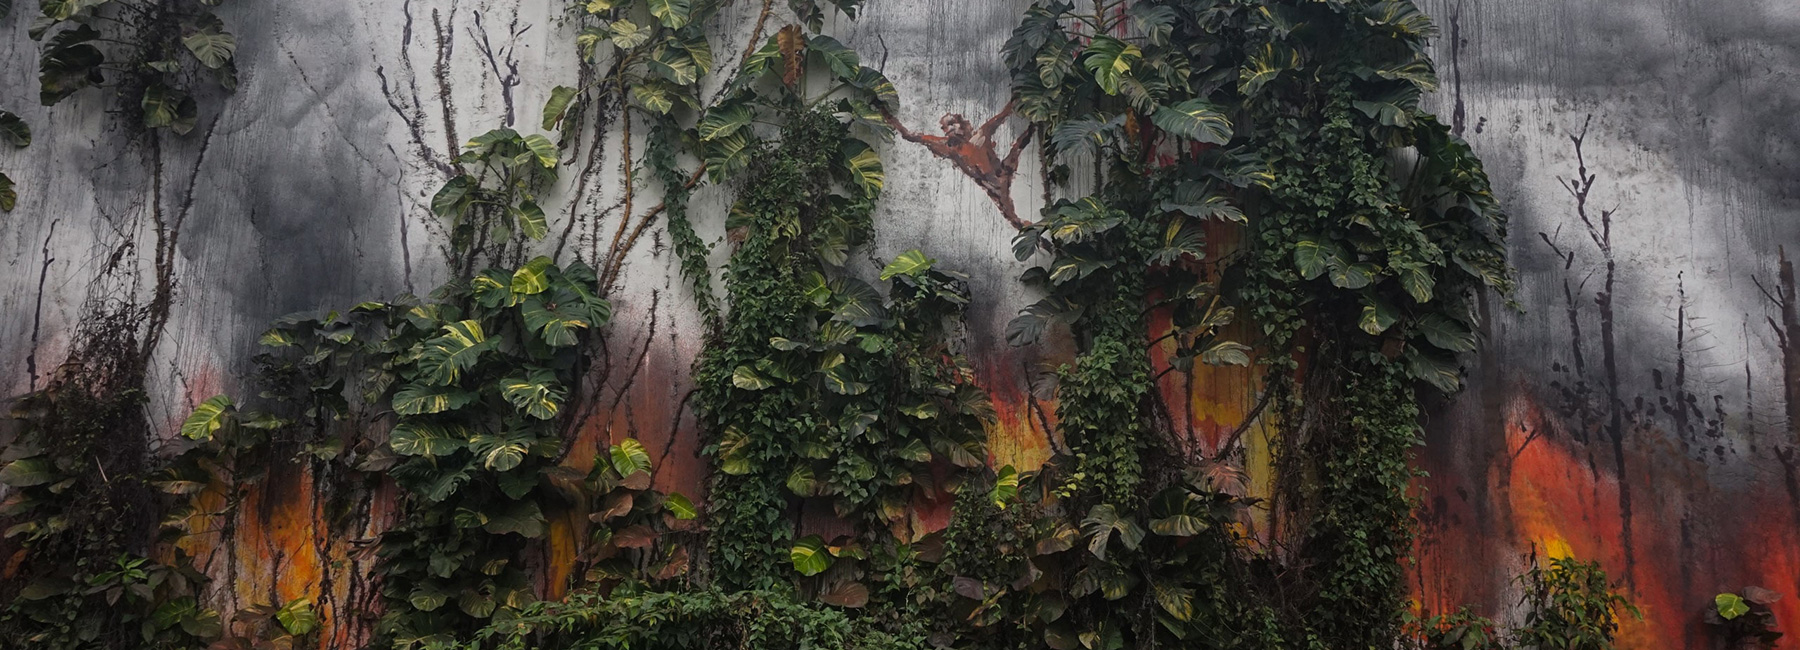 Splash and Burn วอนหยุดทำลายป่าในอินโดฯ เพื่ออตุสาหกรรมน้ำมันปาล์มเสียที!!